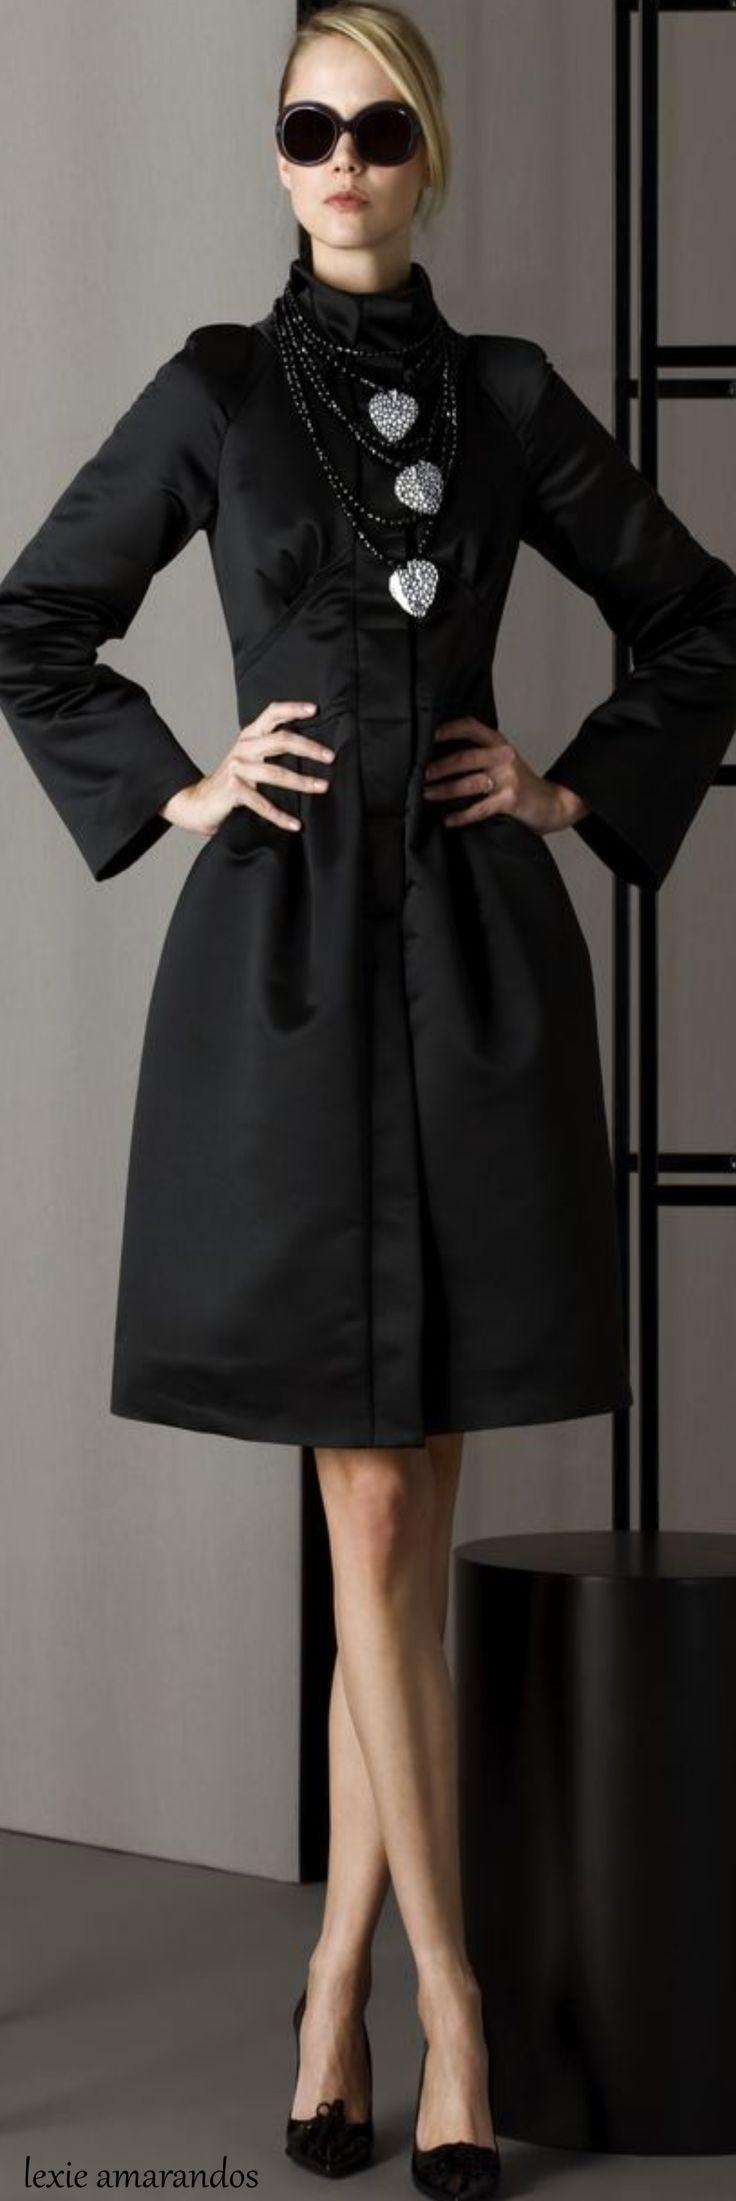 Very elegant day dress. Love this item